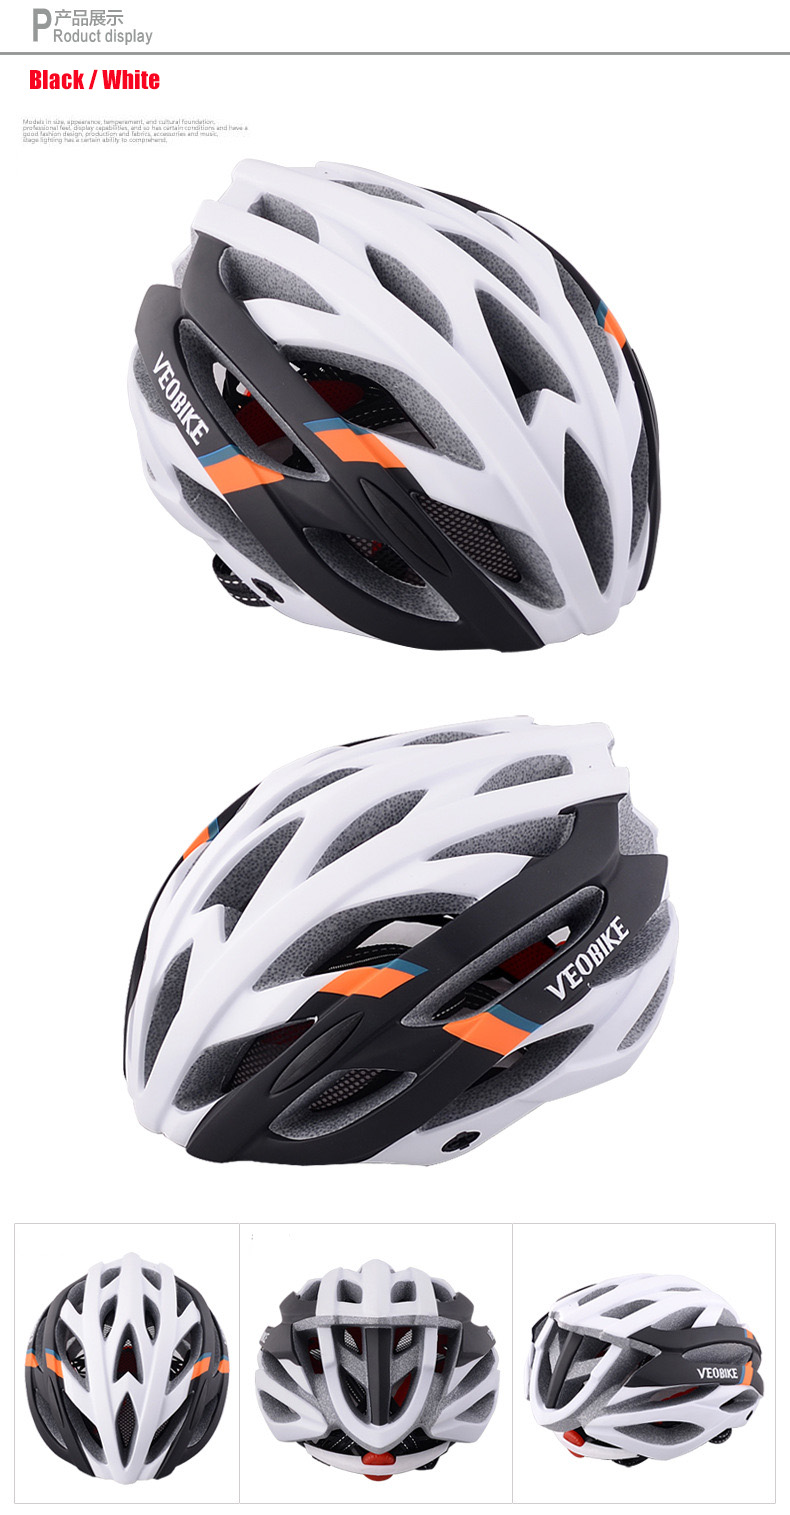 VEOBIK Professional Cycling Road Bike Cycling Helmet Men Bicycle ... 080caba34